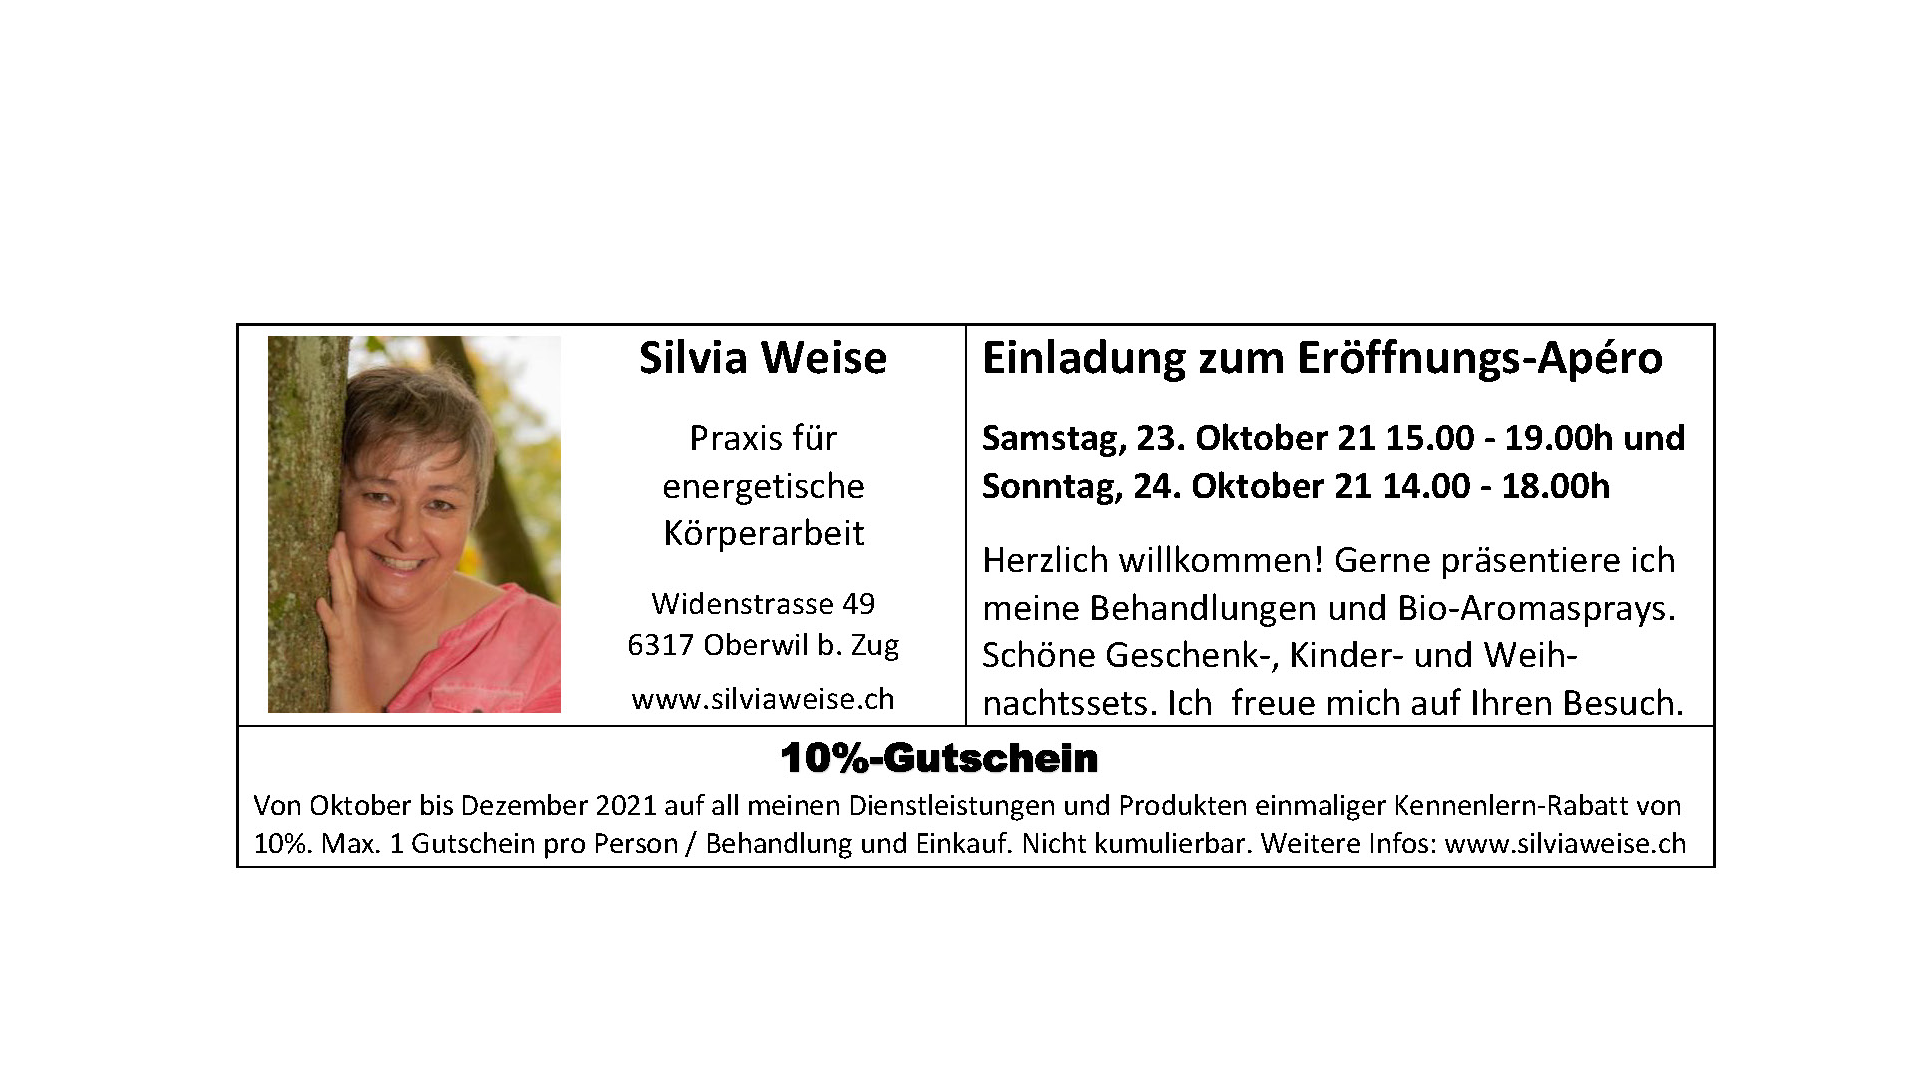 Inserat Dorfzytig - Silvia Weise Oberwil bei Zug - Cosmogetische Beraterin Heilerin